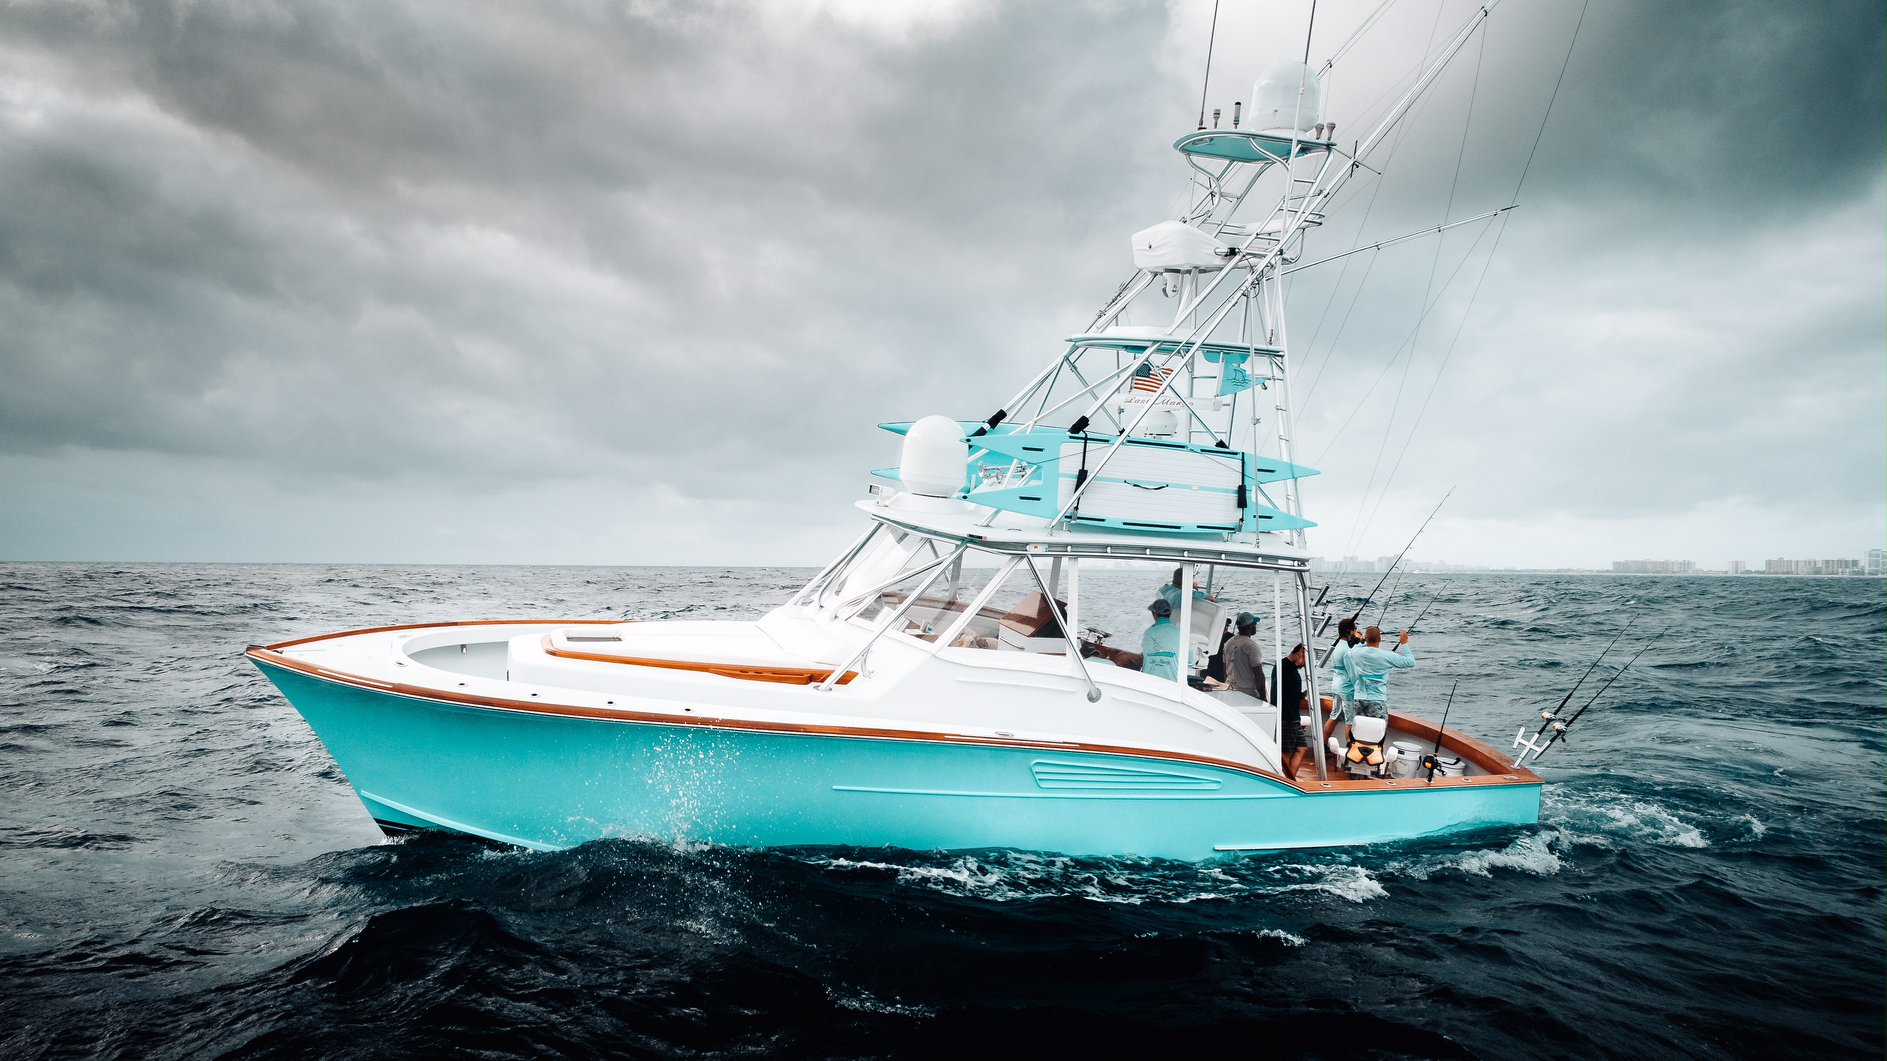 rybovich 42 - seakeeper 6